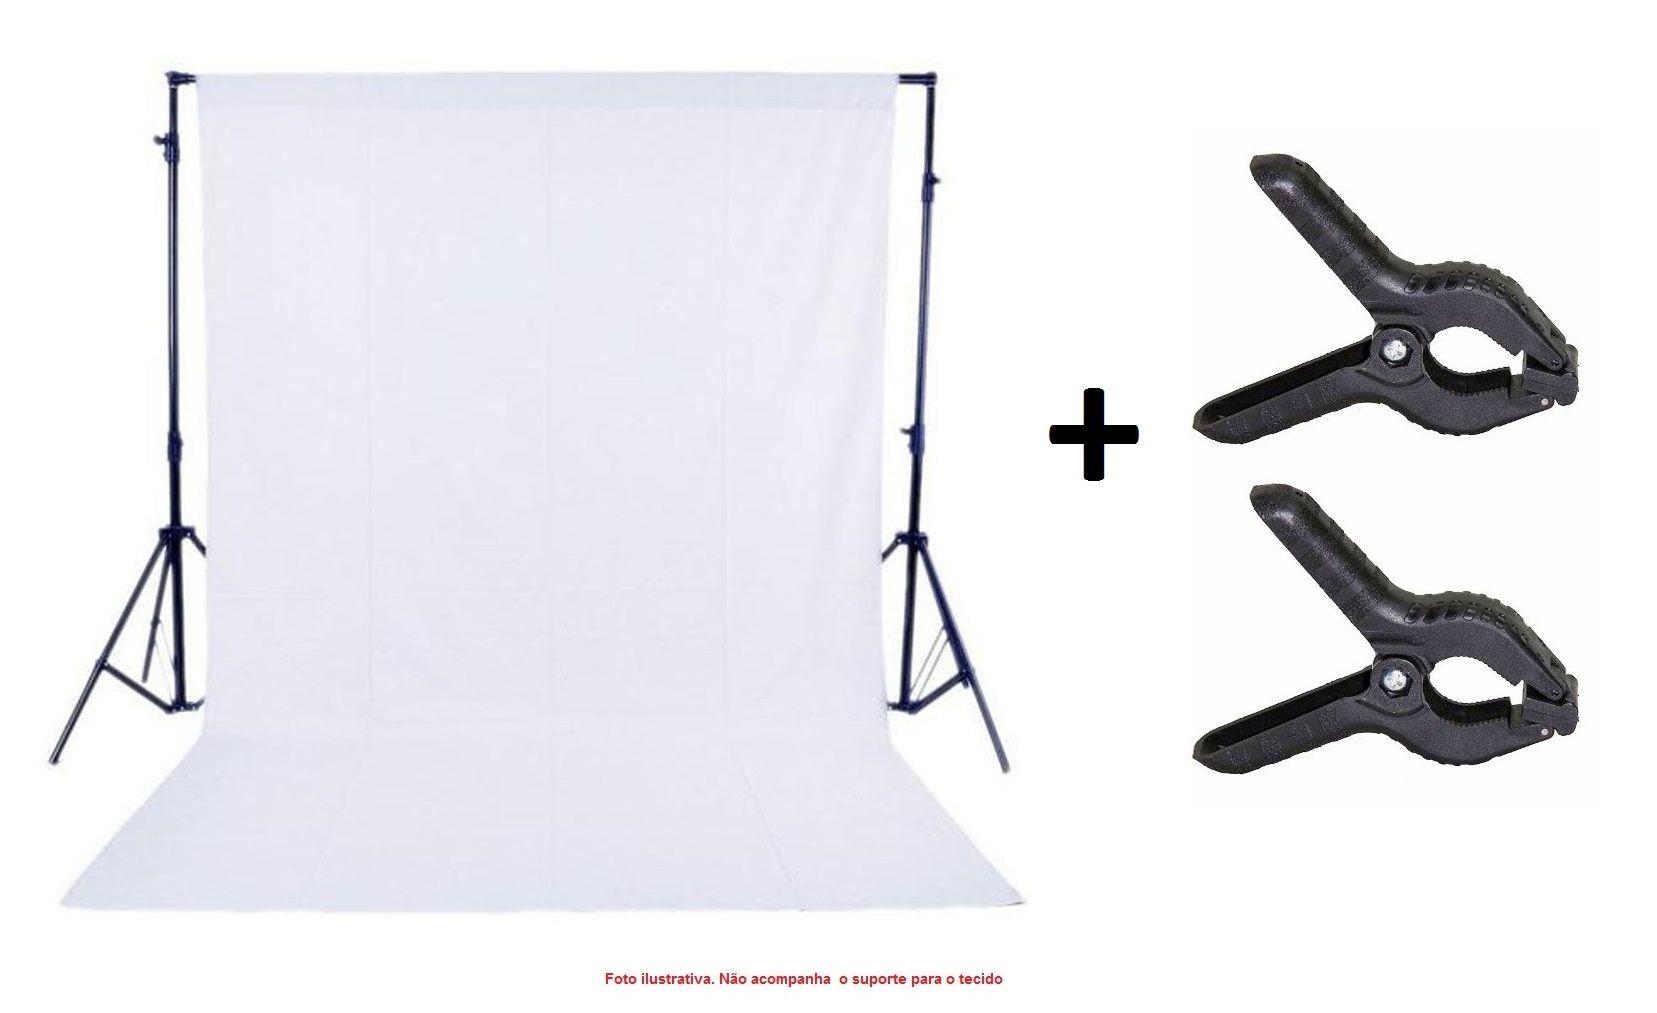 Kit Tecido Chroma Key Branco 3x5m + Grampo Prendedor - TECIDO+YA401